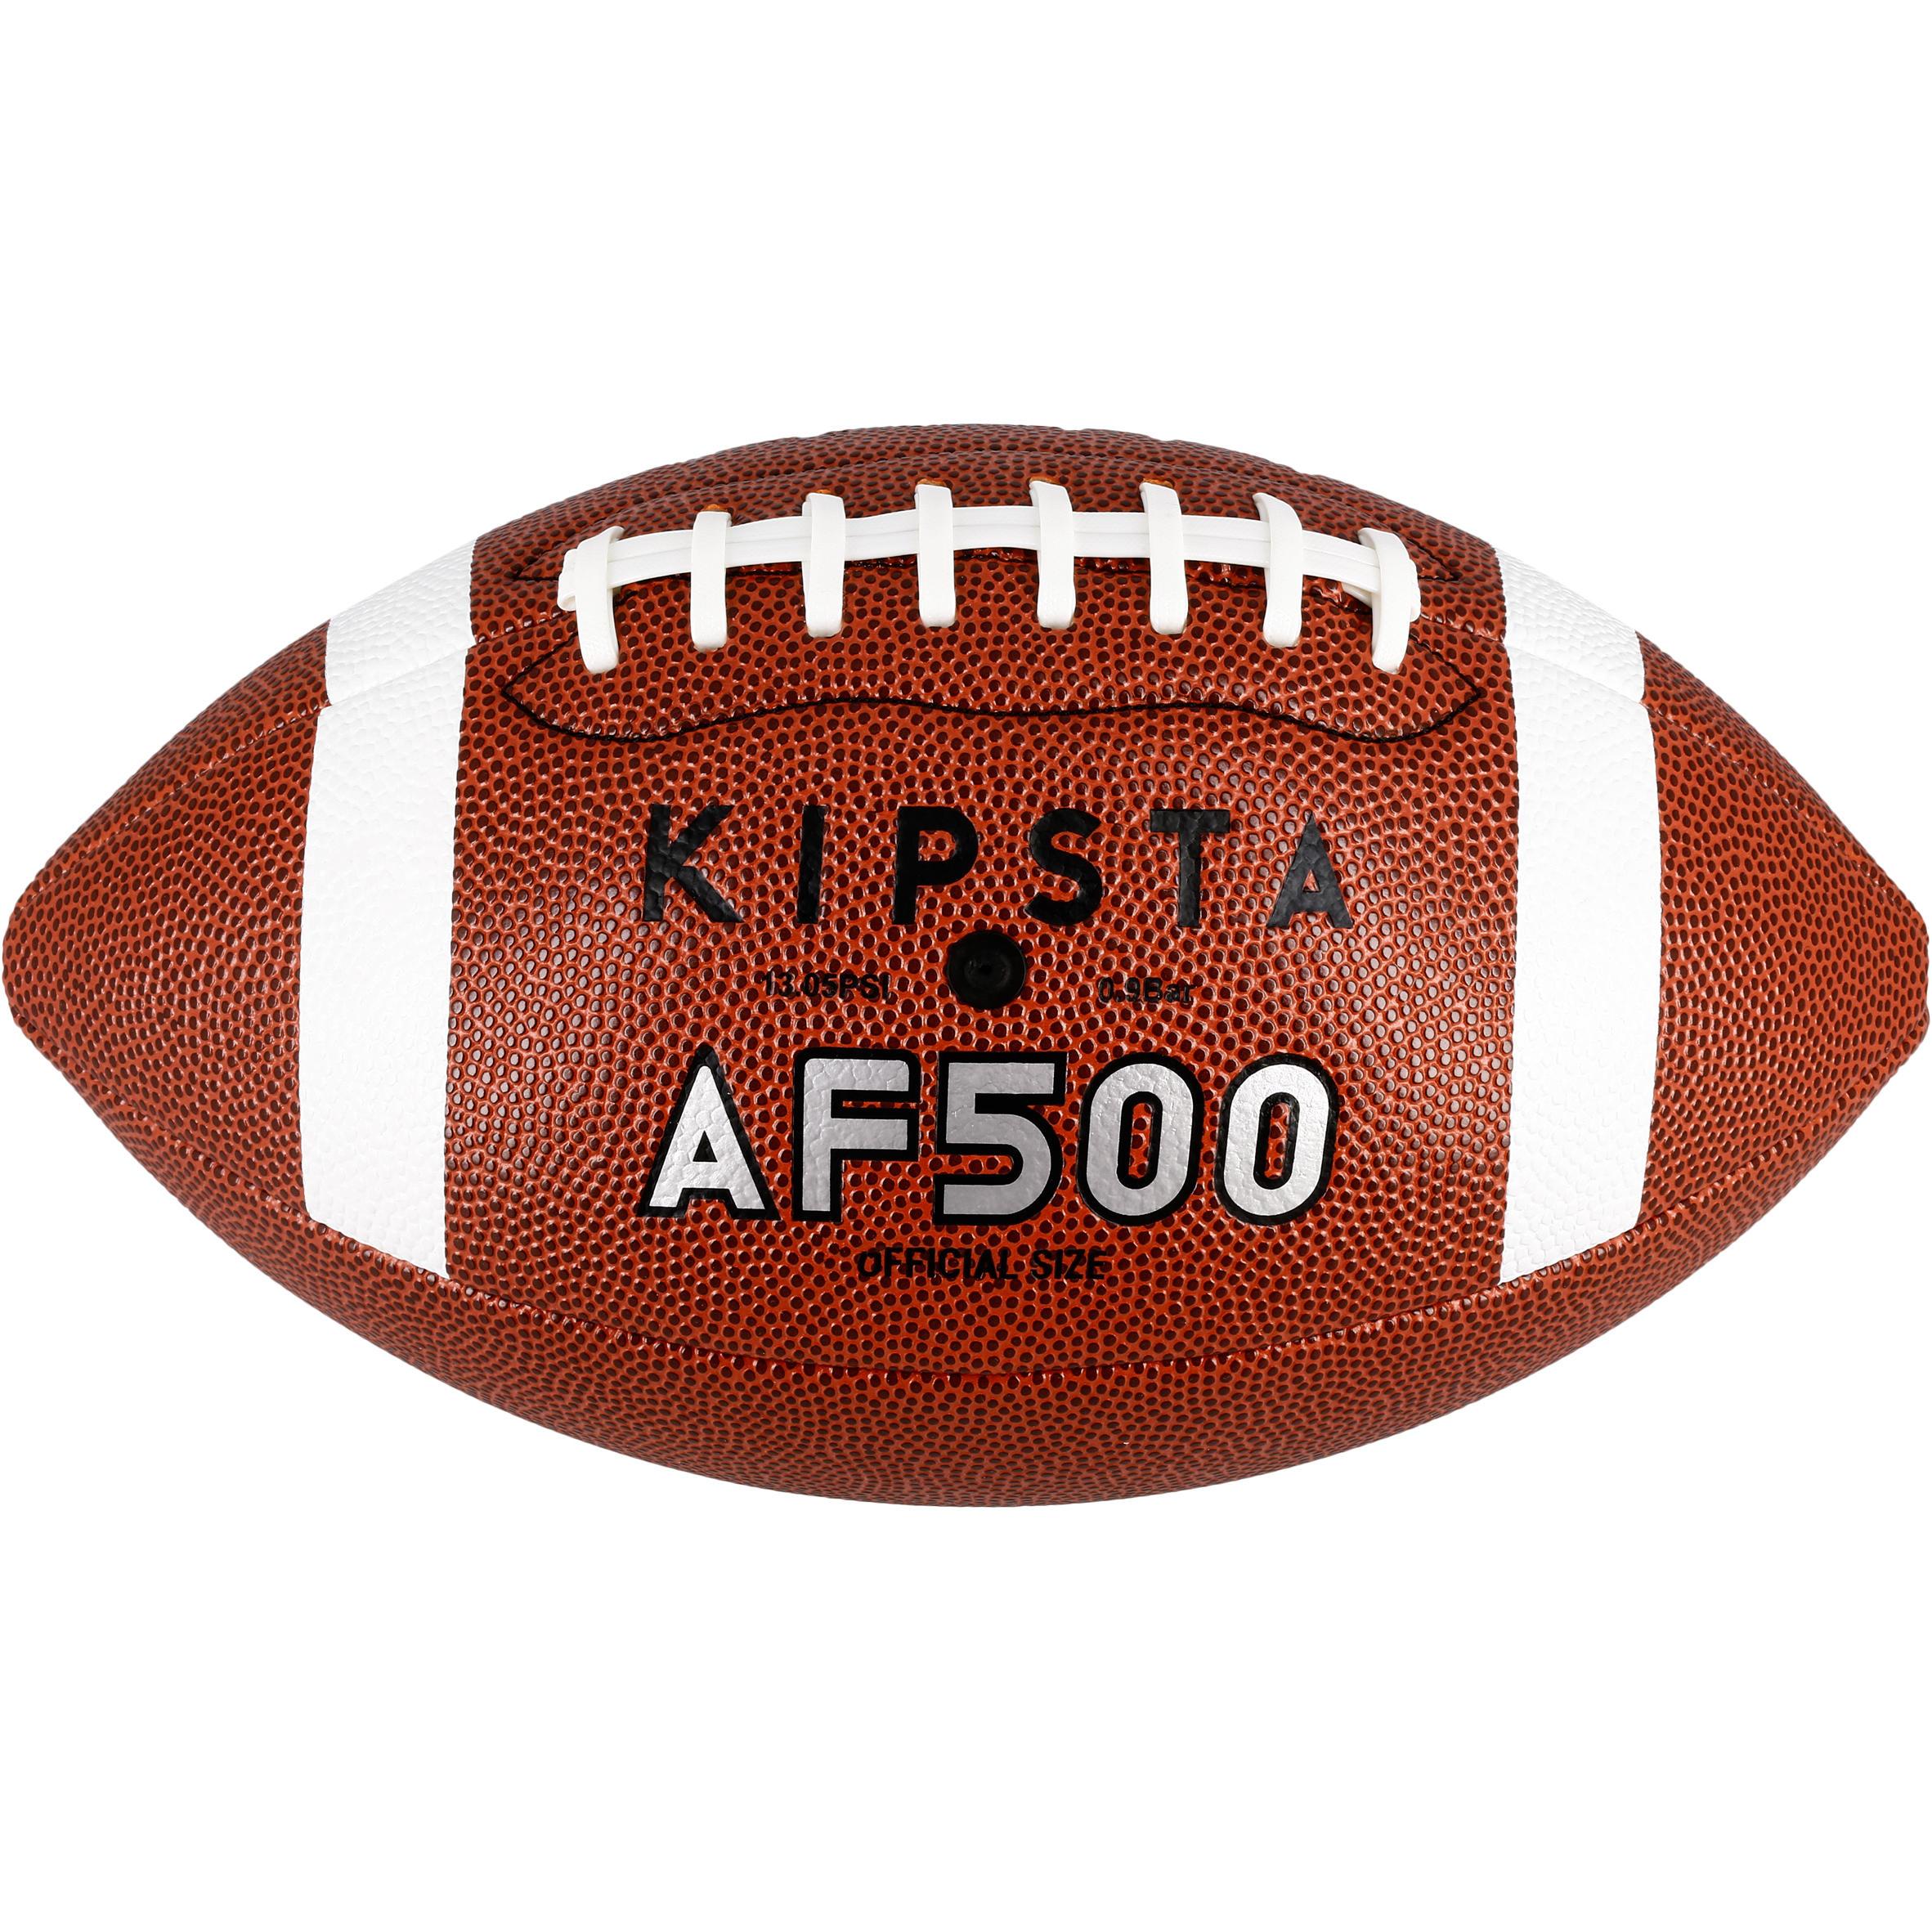 Ballon de football AF 500 taille officielle brun